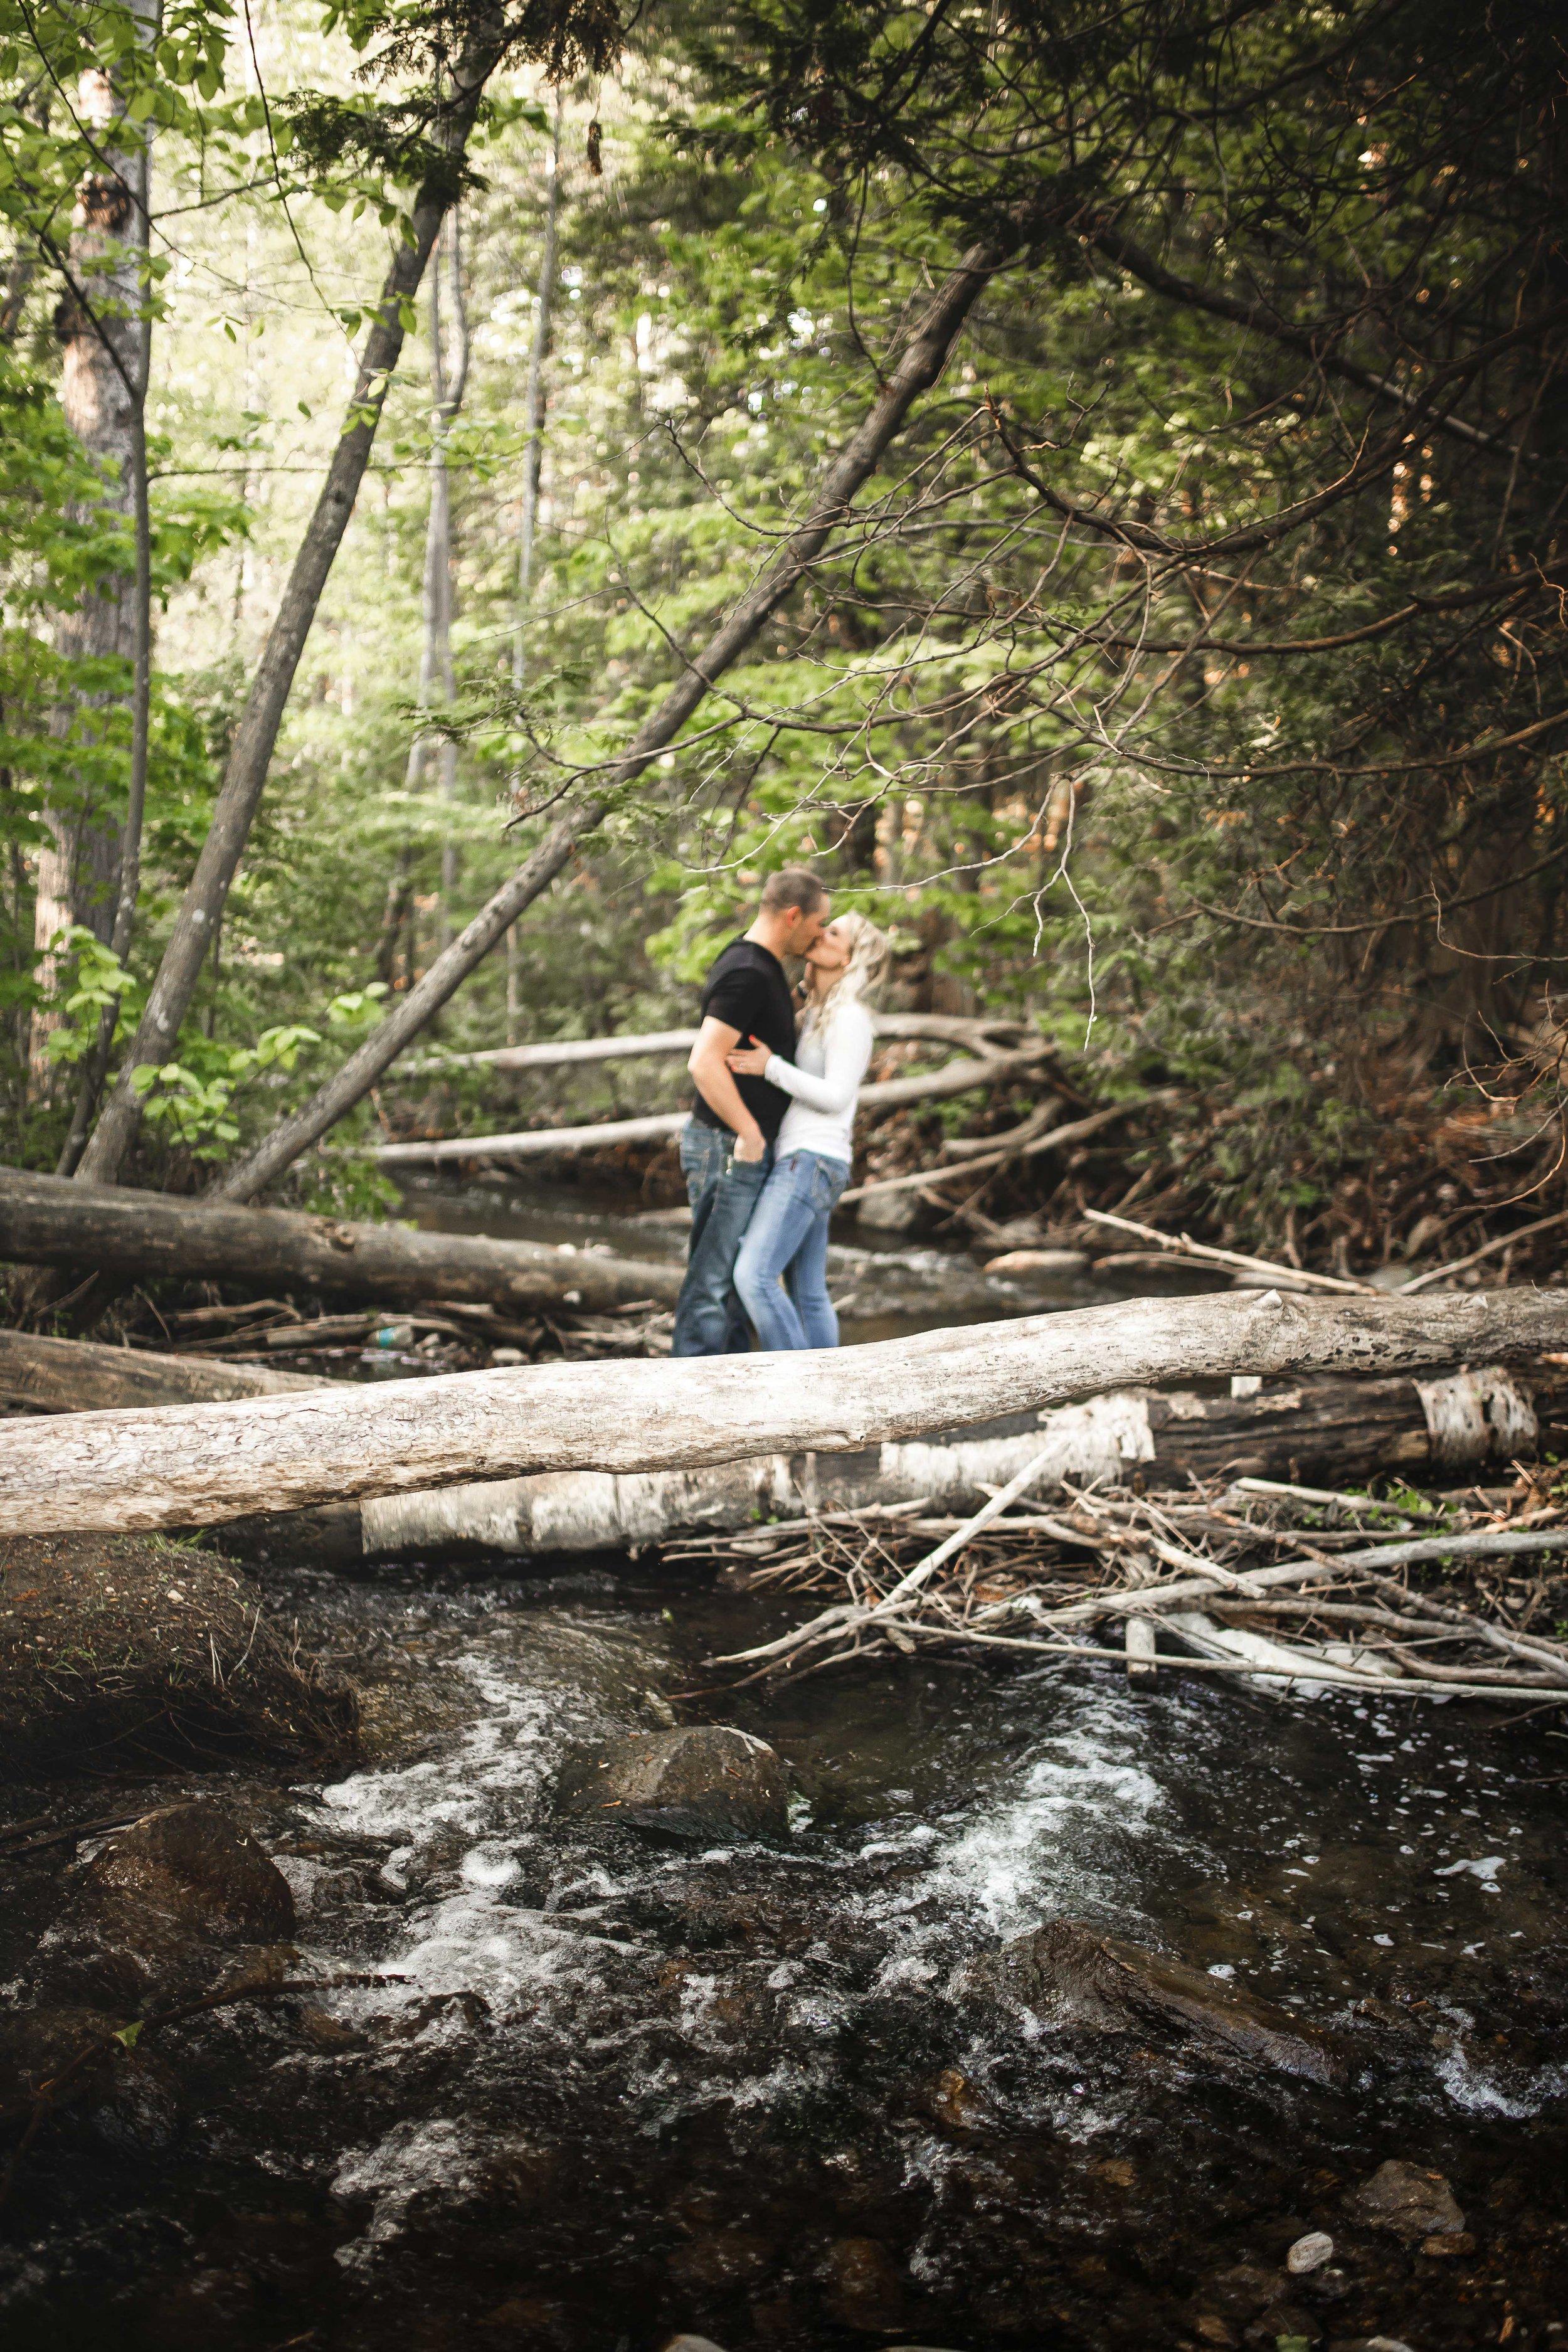 Amy-D-Photography--Wedding-Photography--Barrie-Wedding-Photography--Engagement-Session---Engagement-Pose-60.jpg